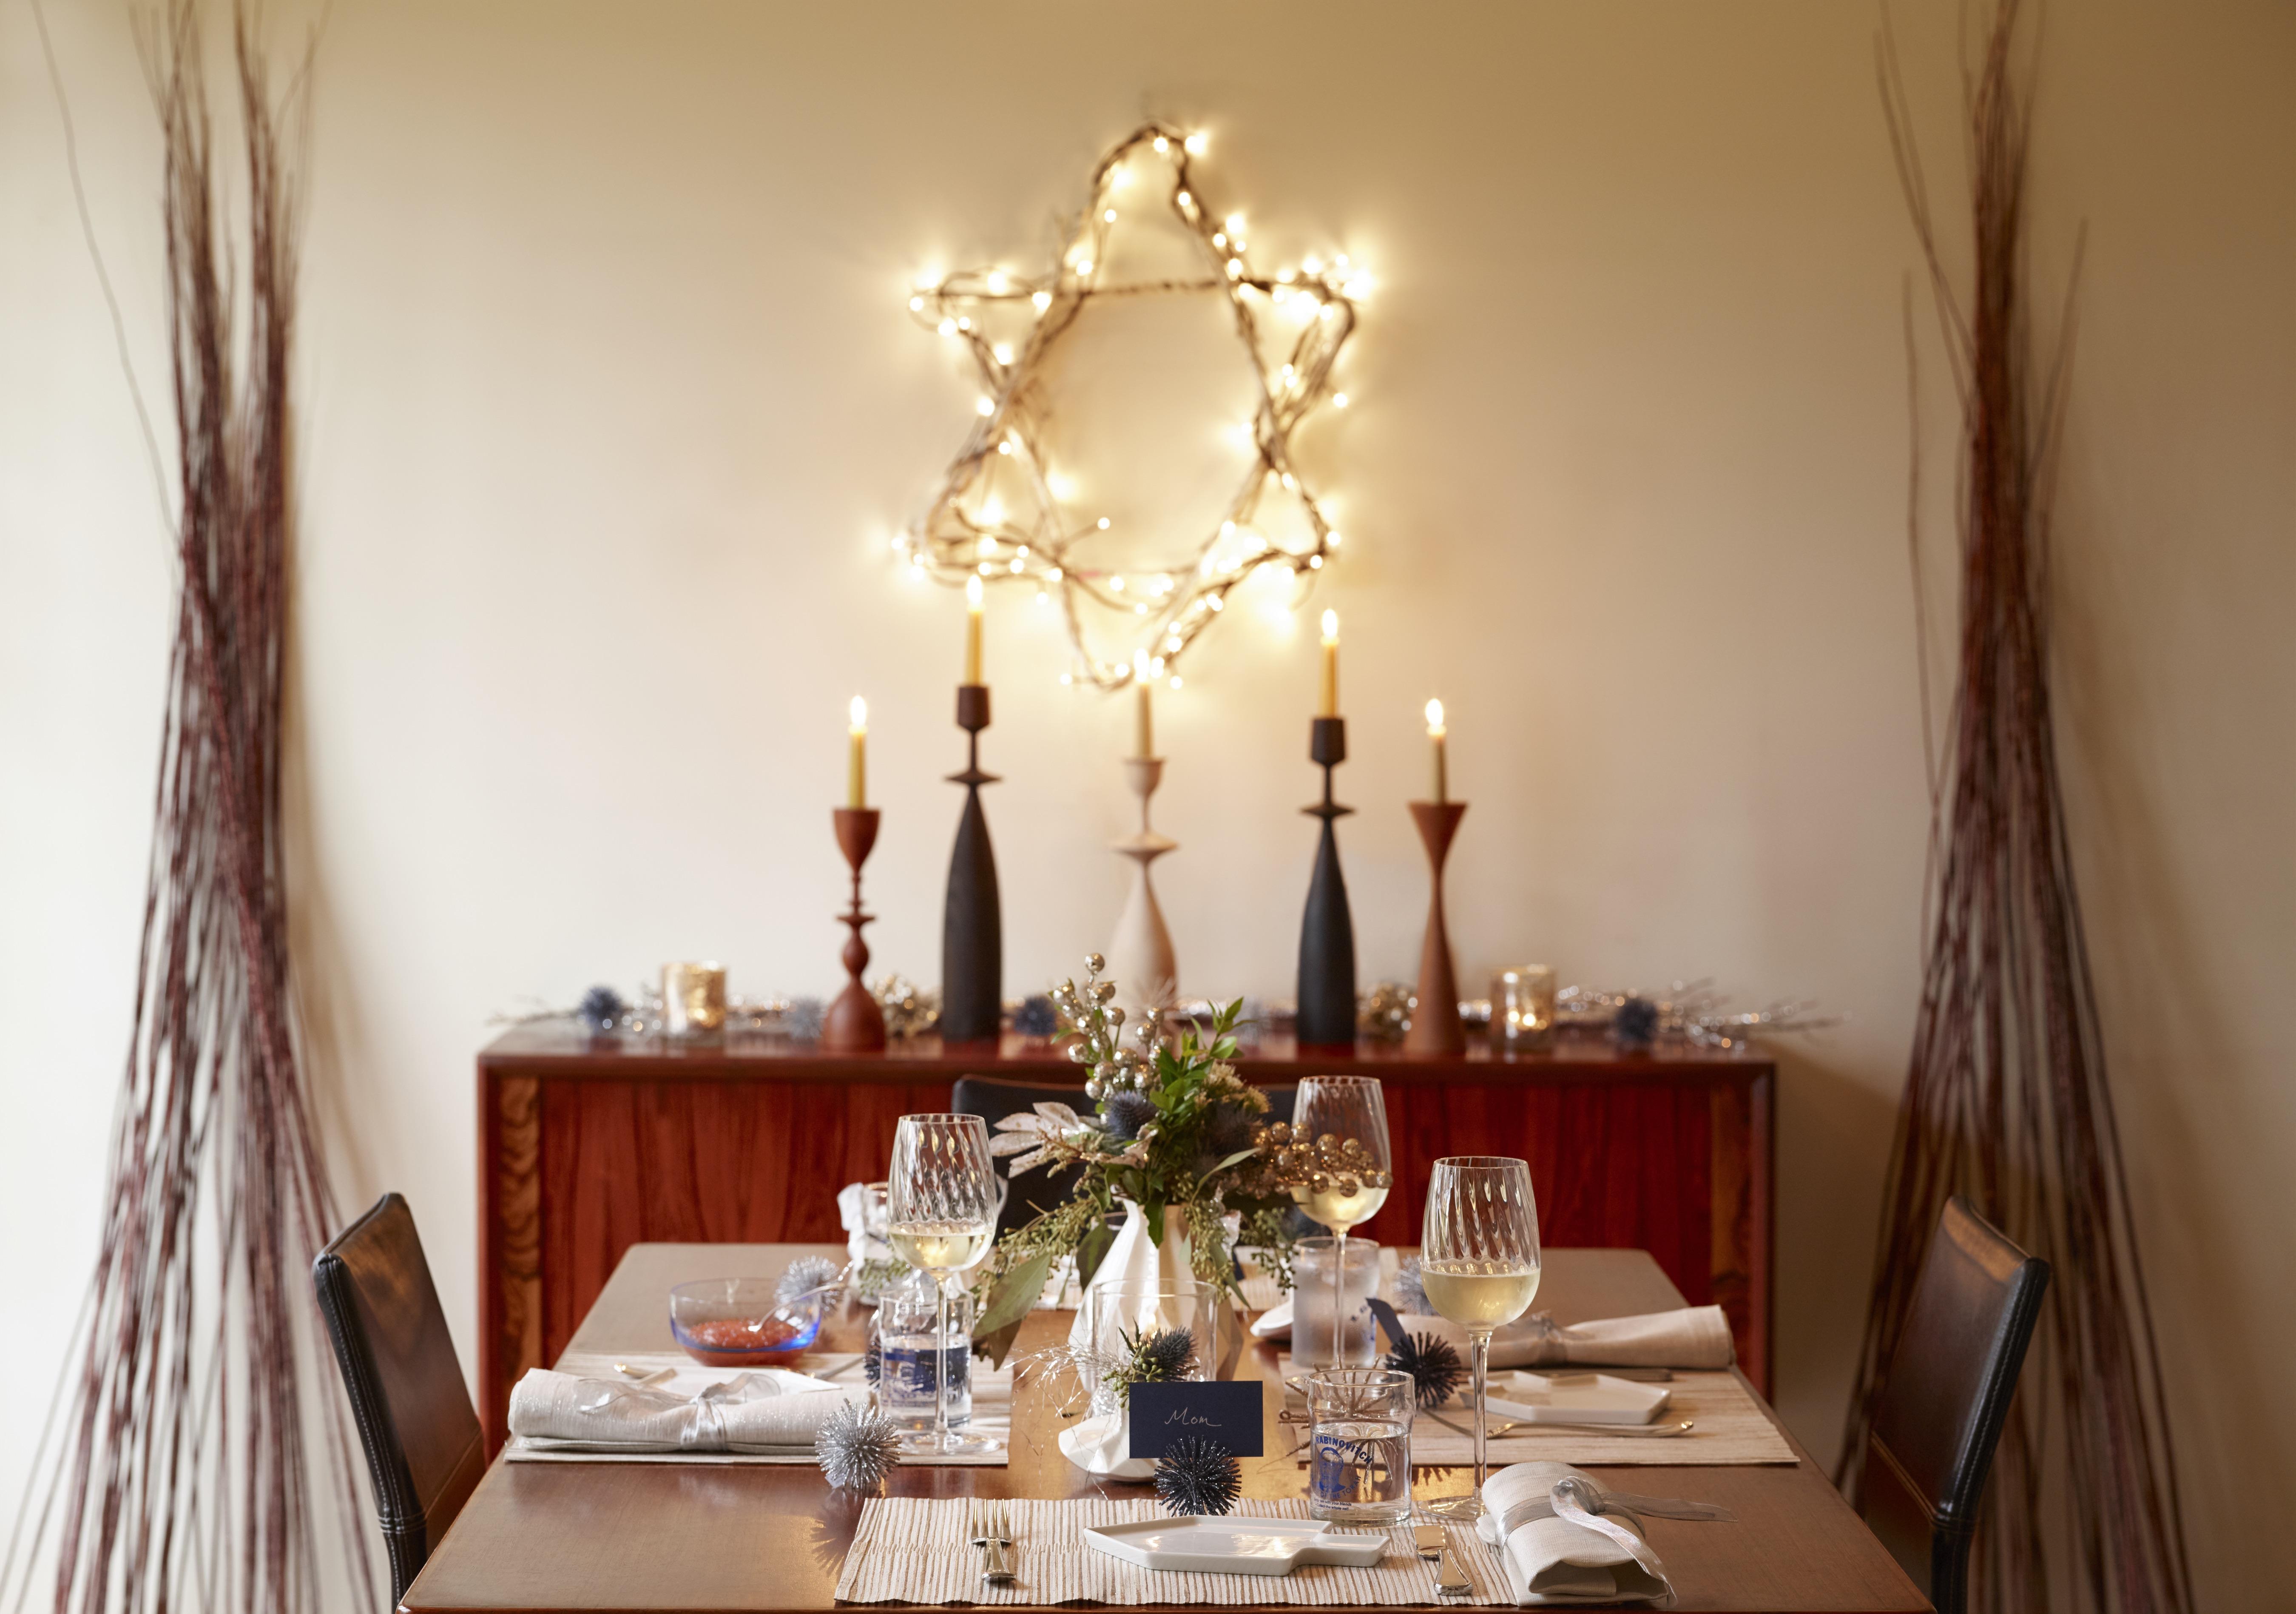 Hanukkah ornaments for a tree - 2015 12 01 1448933988 8265440 Hanukkah_table1 Jpg